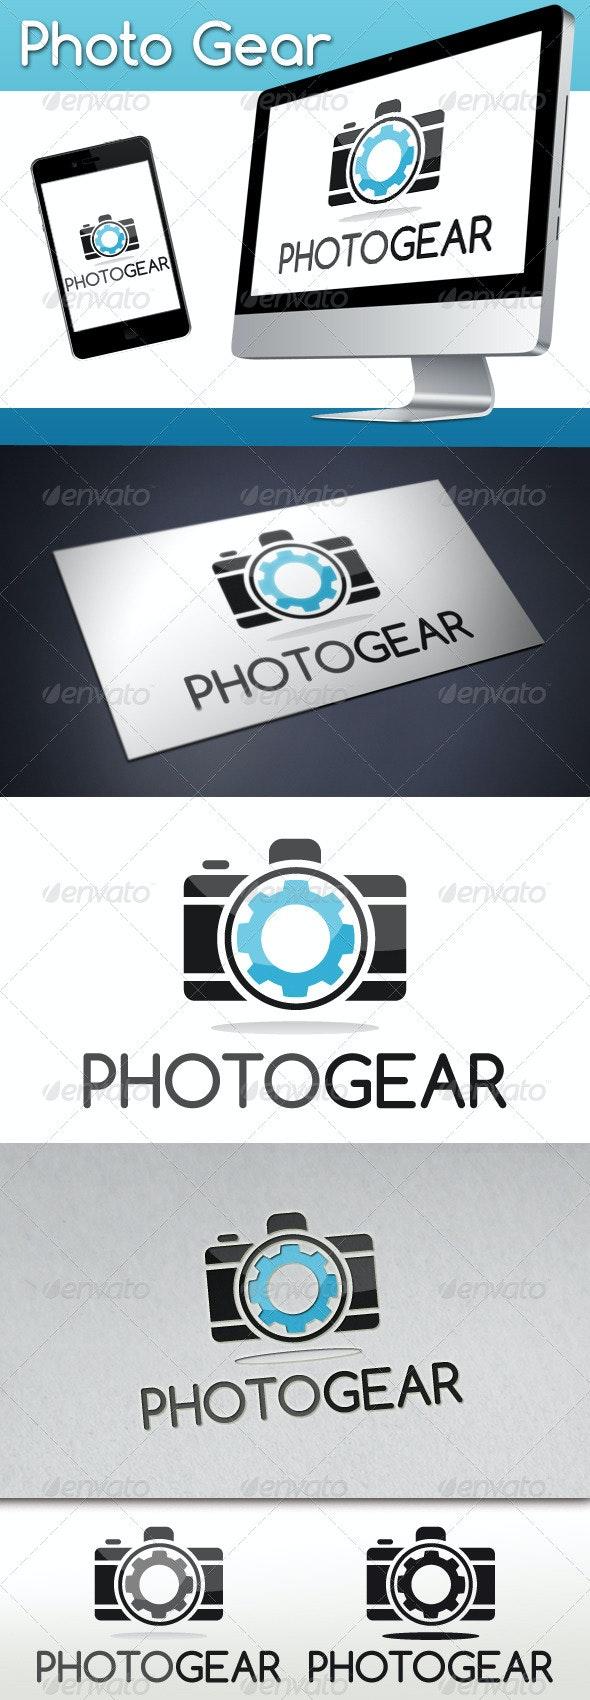 Photo Gear Logo - Objects Logo Templates